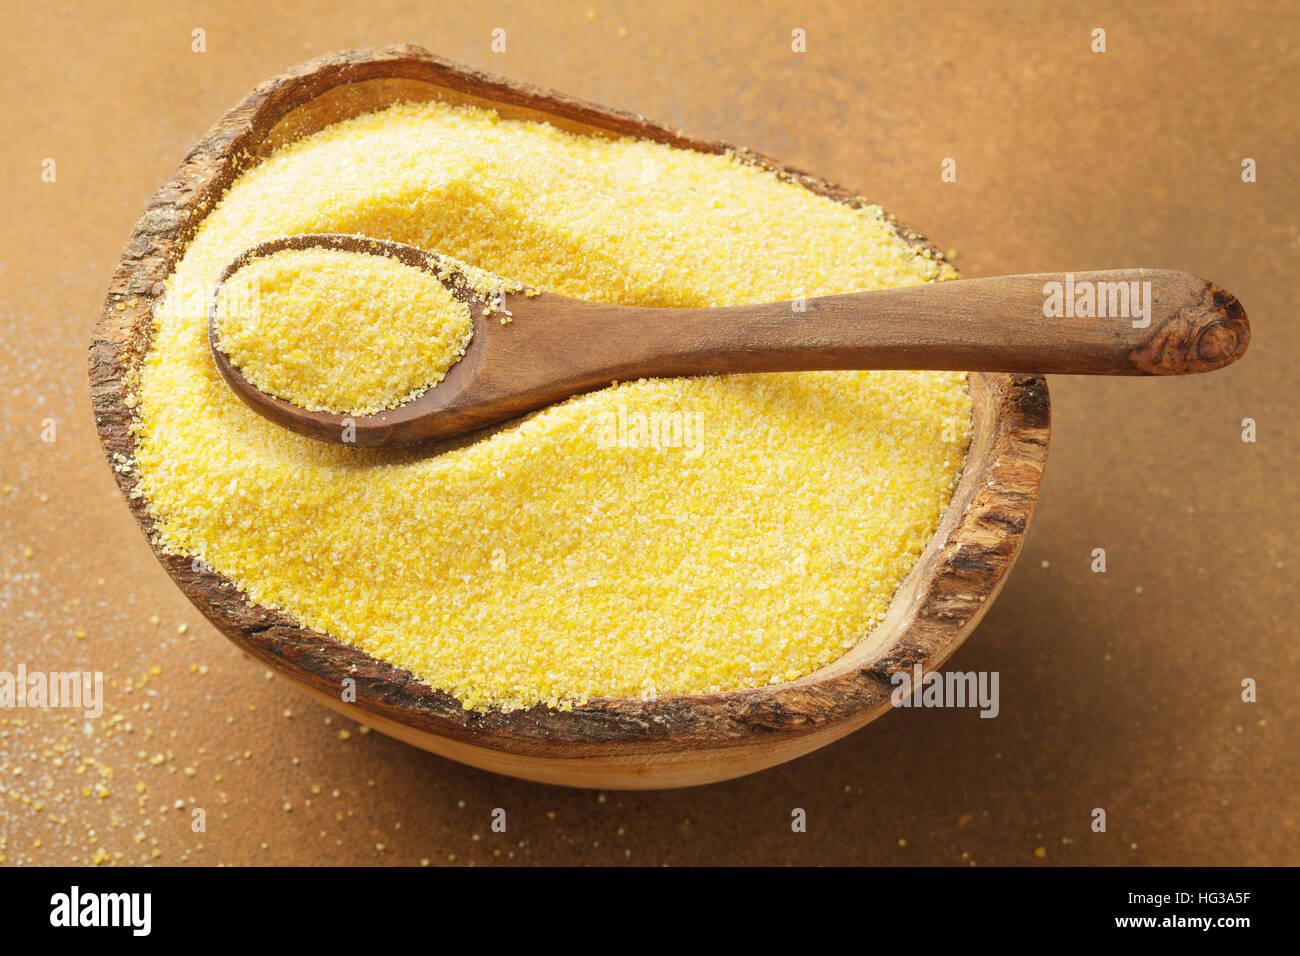 dried polenta - Stock Image